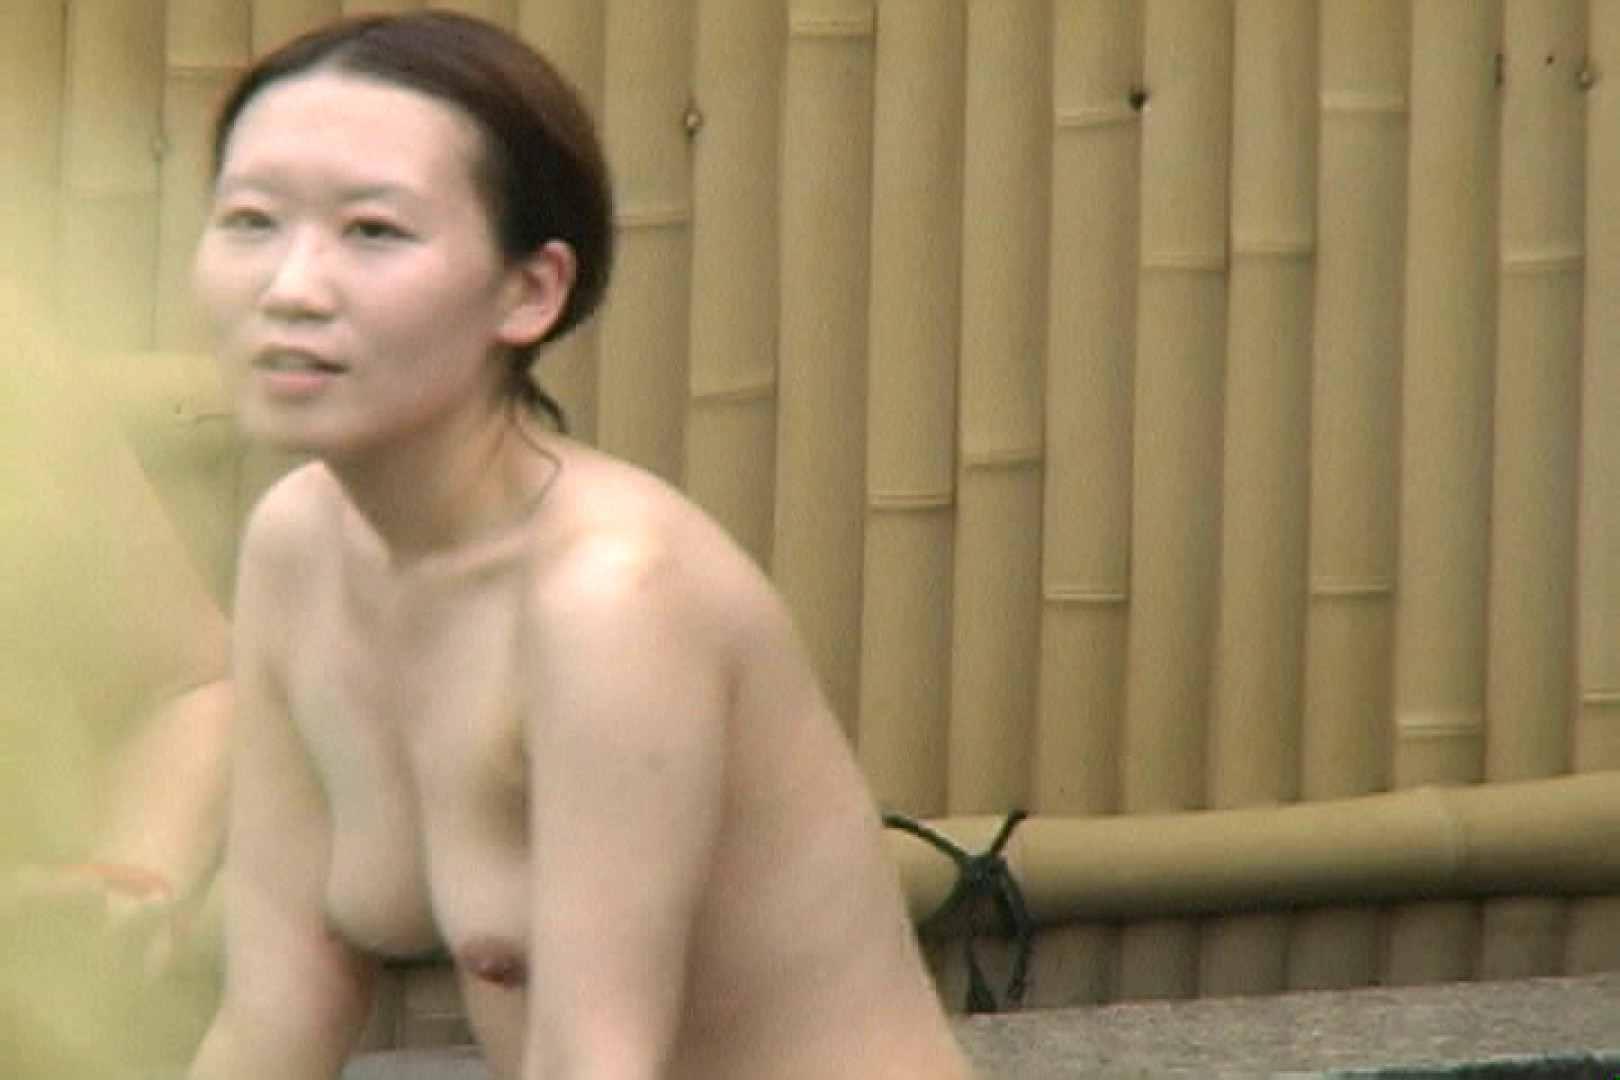 Aquaな露天風呂Vol.10【VIP】 露天風呂編 | 盗撮シリーズ  95PIX 29